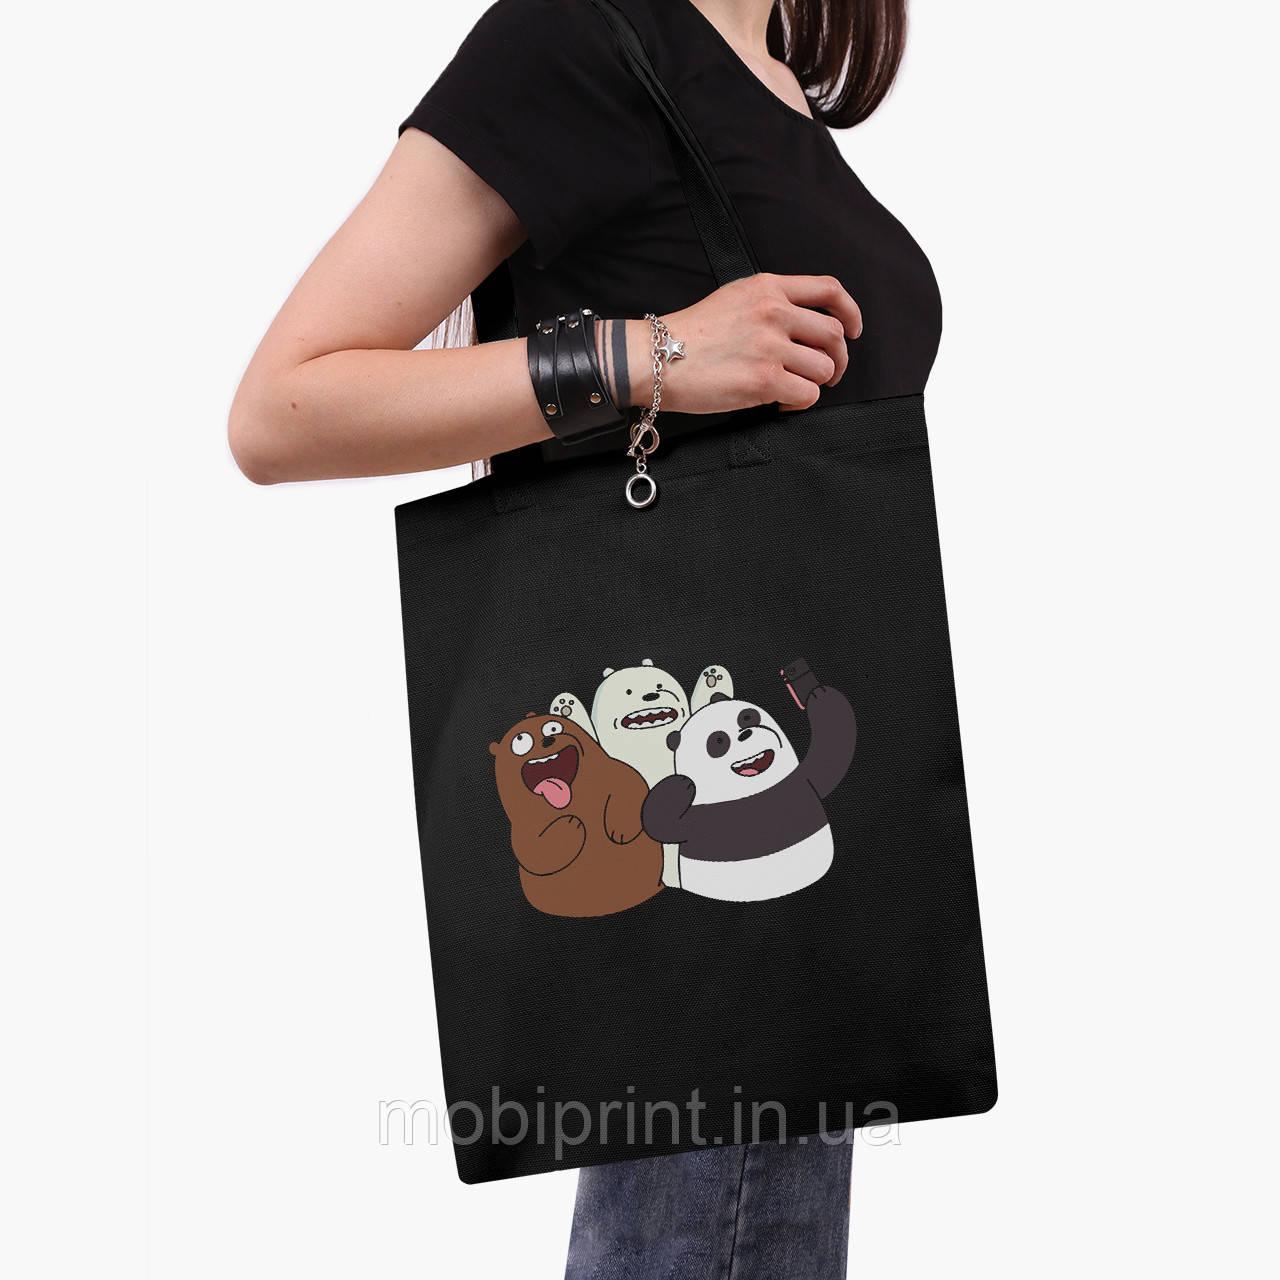 Еко сумка шоппер чорна Вся правда про ведмедів (We Bare Bears) (9227-2665-2) 41*35 см